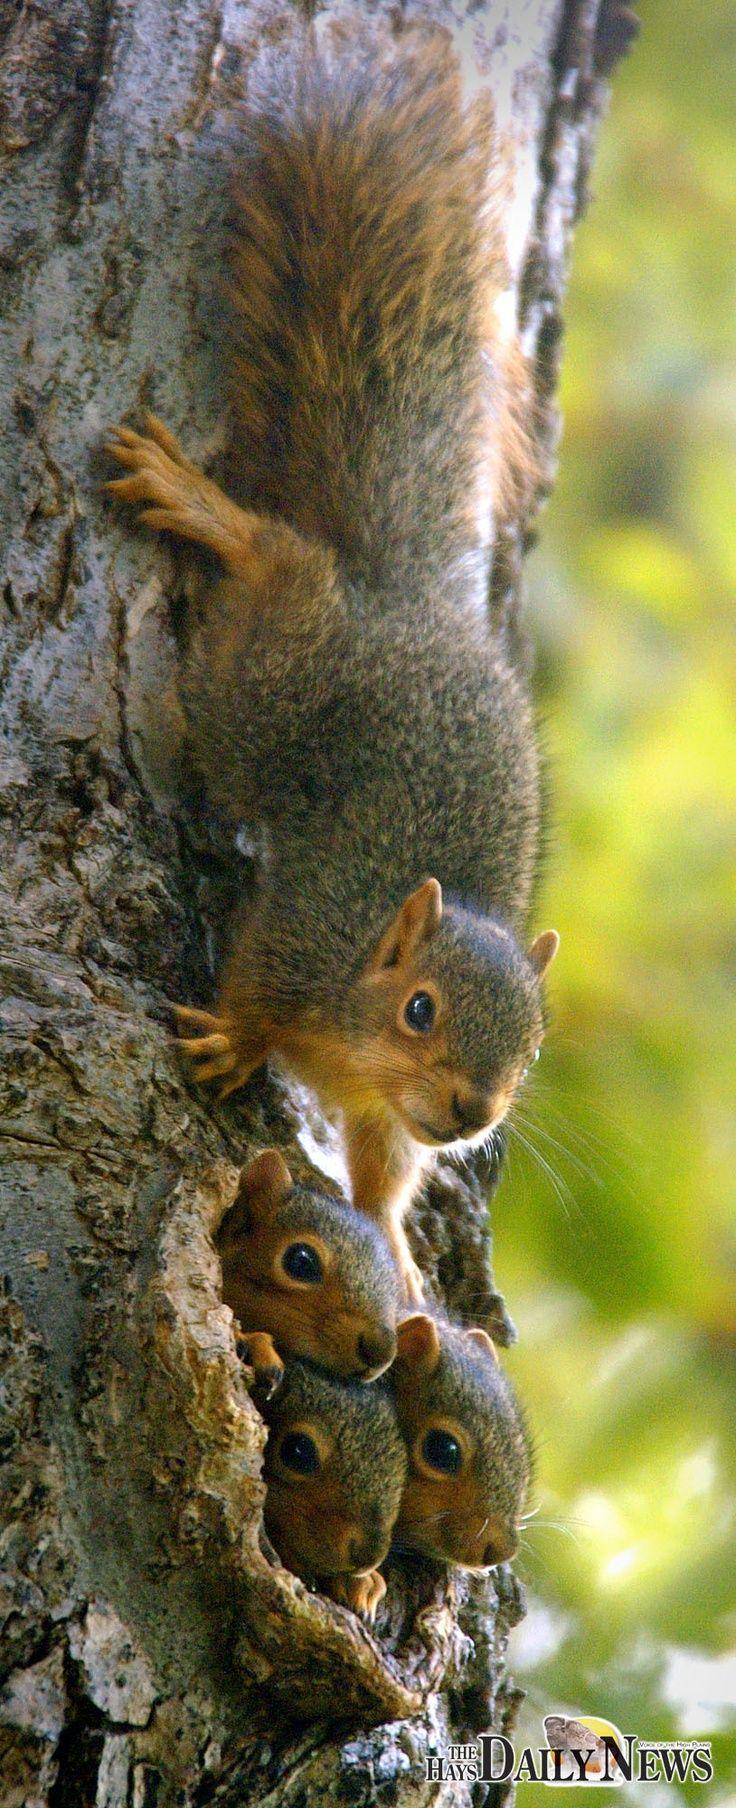 Nutty Squirrel Porno squirrels   animals, baby animals, cute squirrel